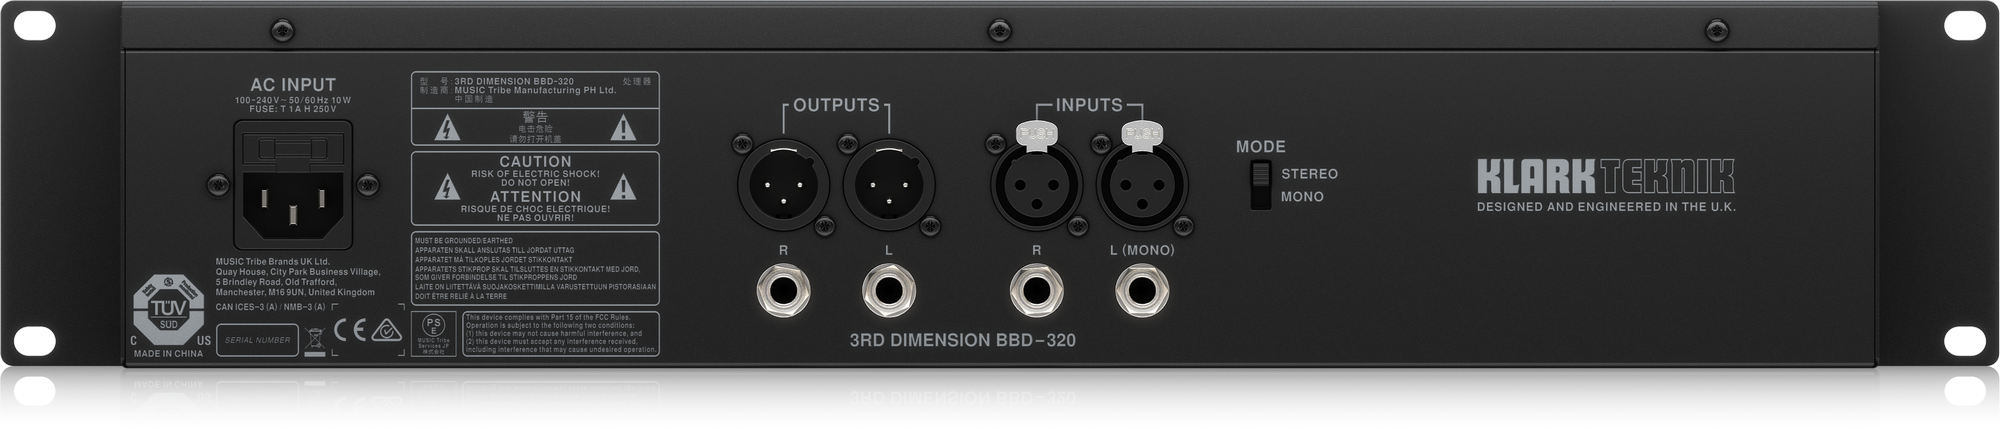 Klark Teknik - X2C - CREA 3RD DIMENSION BBD-320-EU